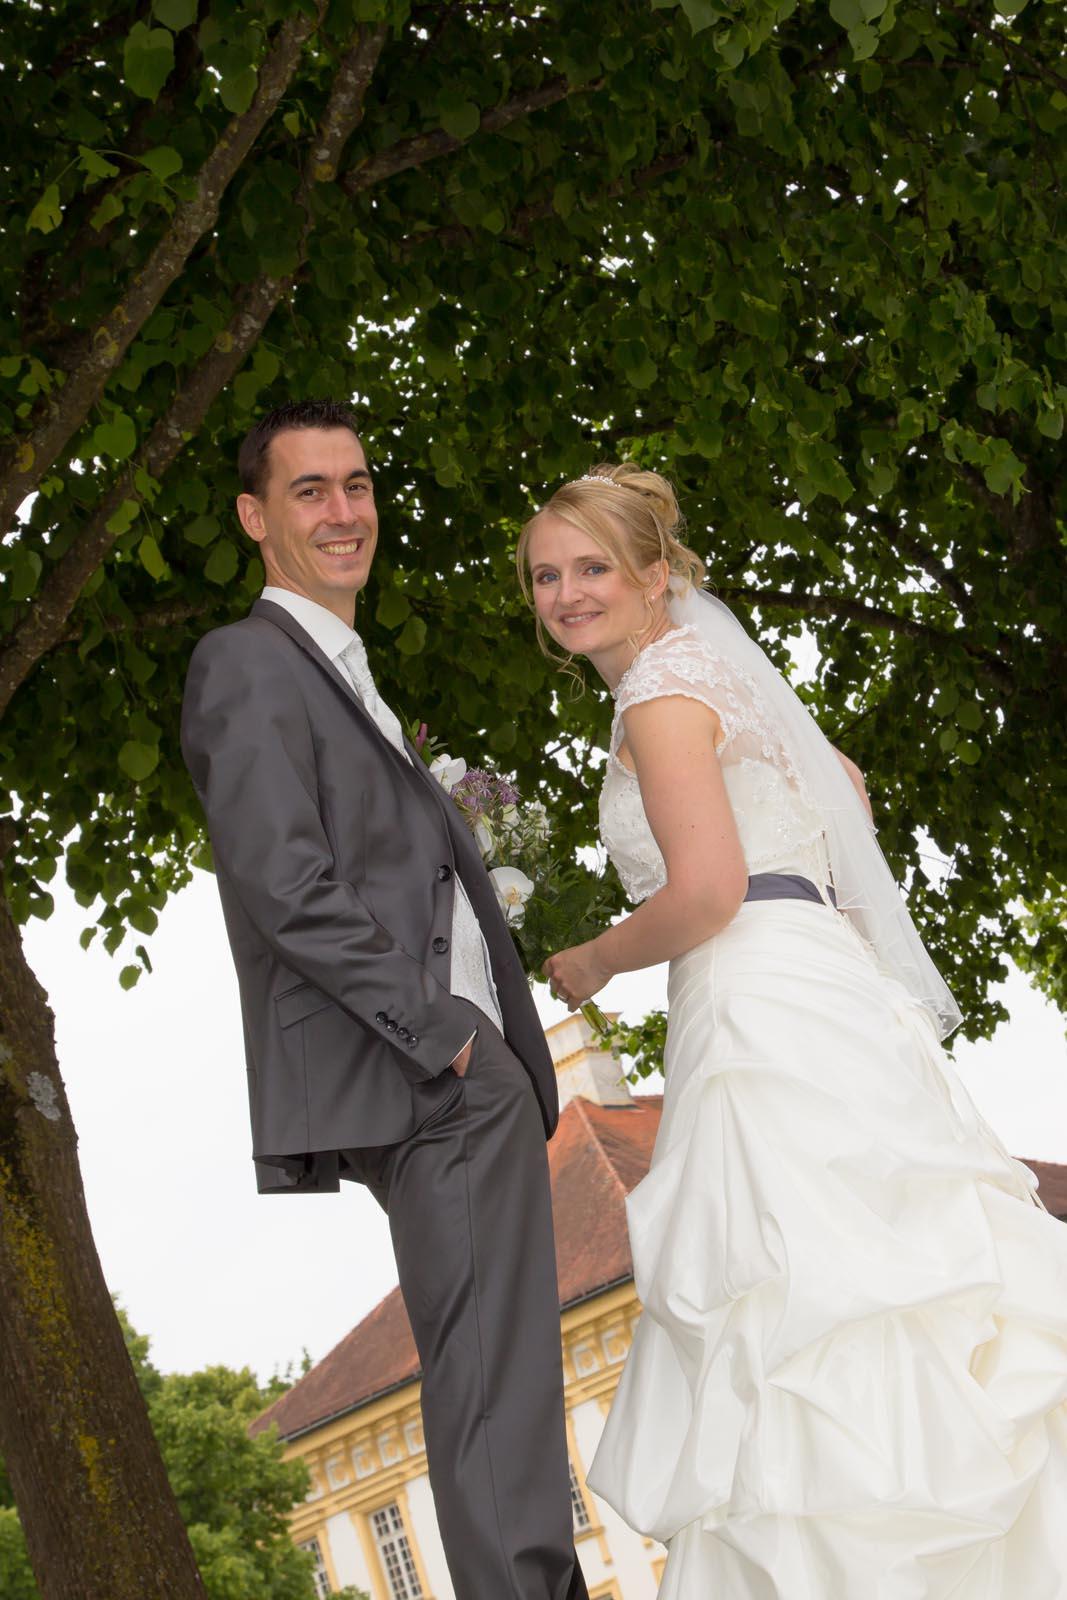 Hochzeit-Portraits-Jacob-Kirche-Hochzeit-Jacob-7214.jpg